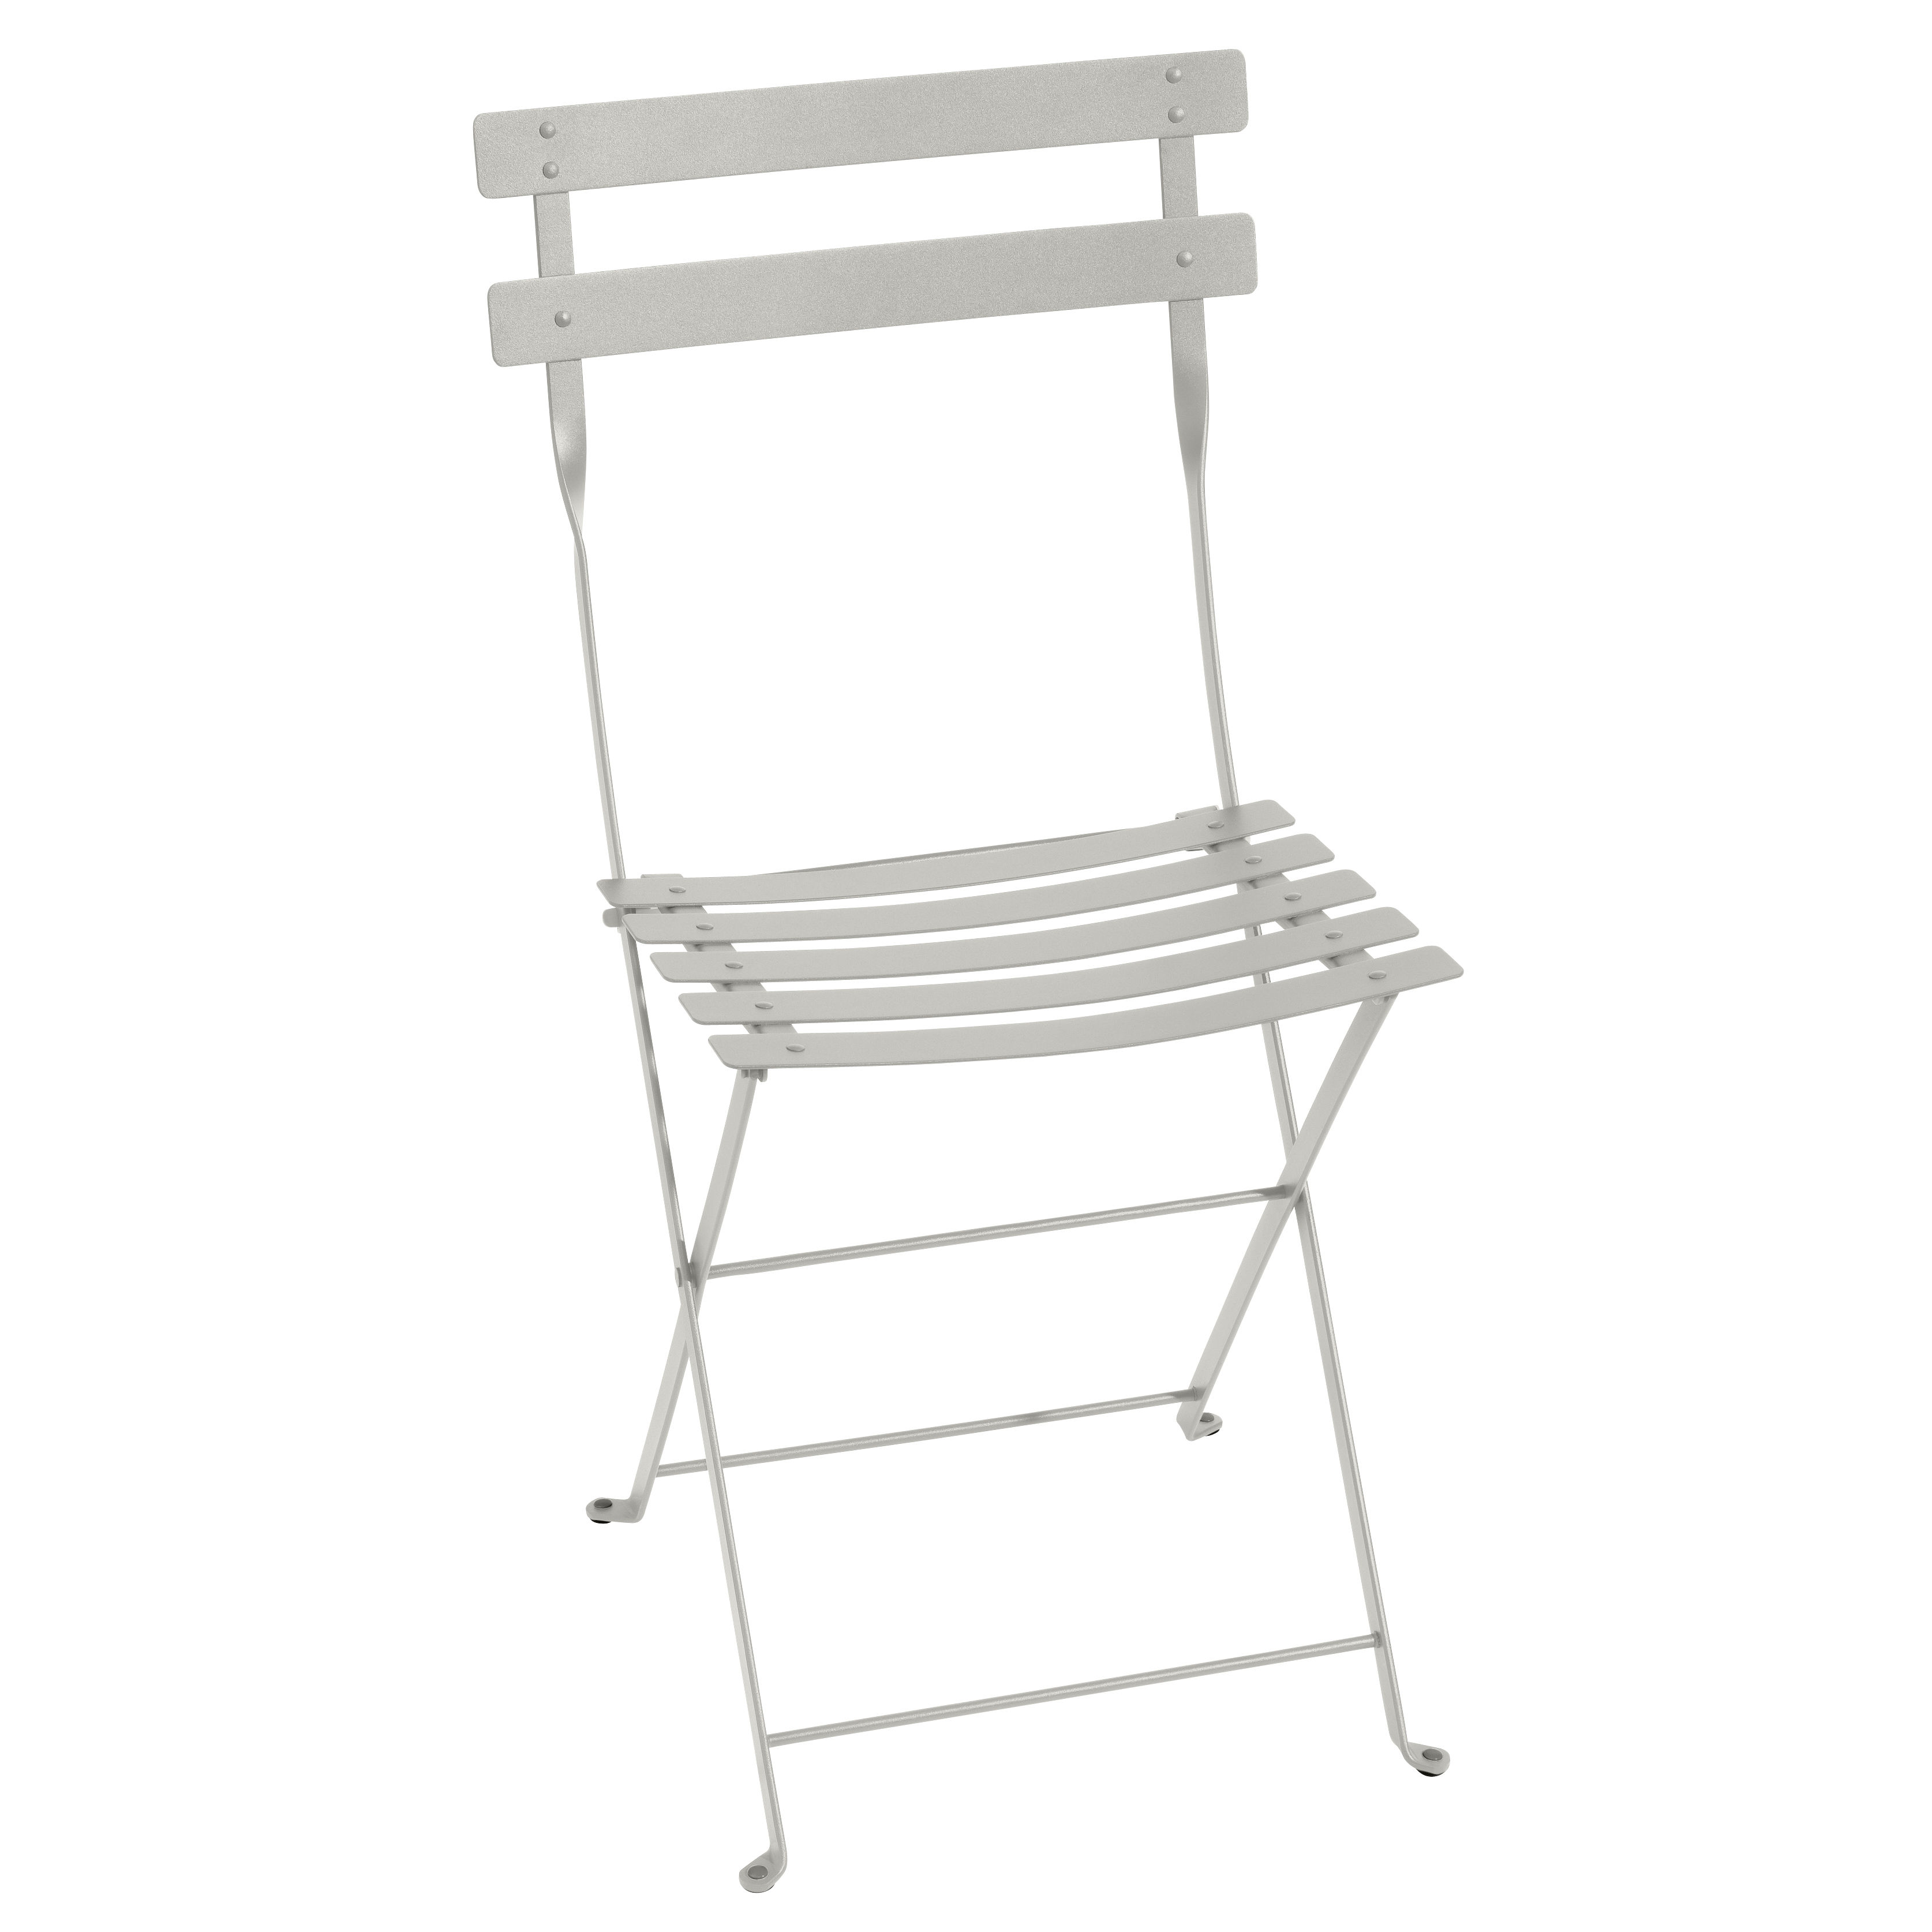 Möbel - Stühle  - Bistro Klappstuhl / Metall - Fermob - Lehmgrau - lackierter Stahl